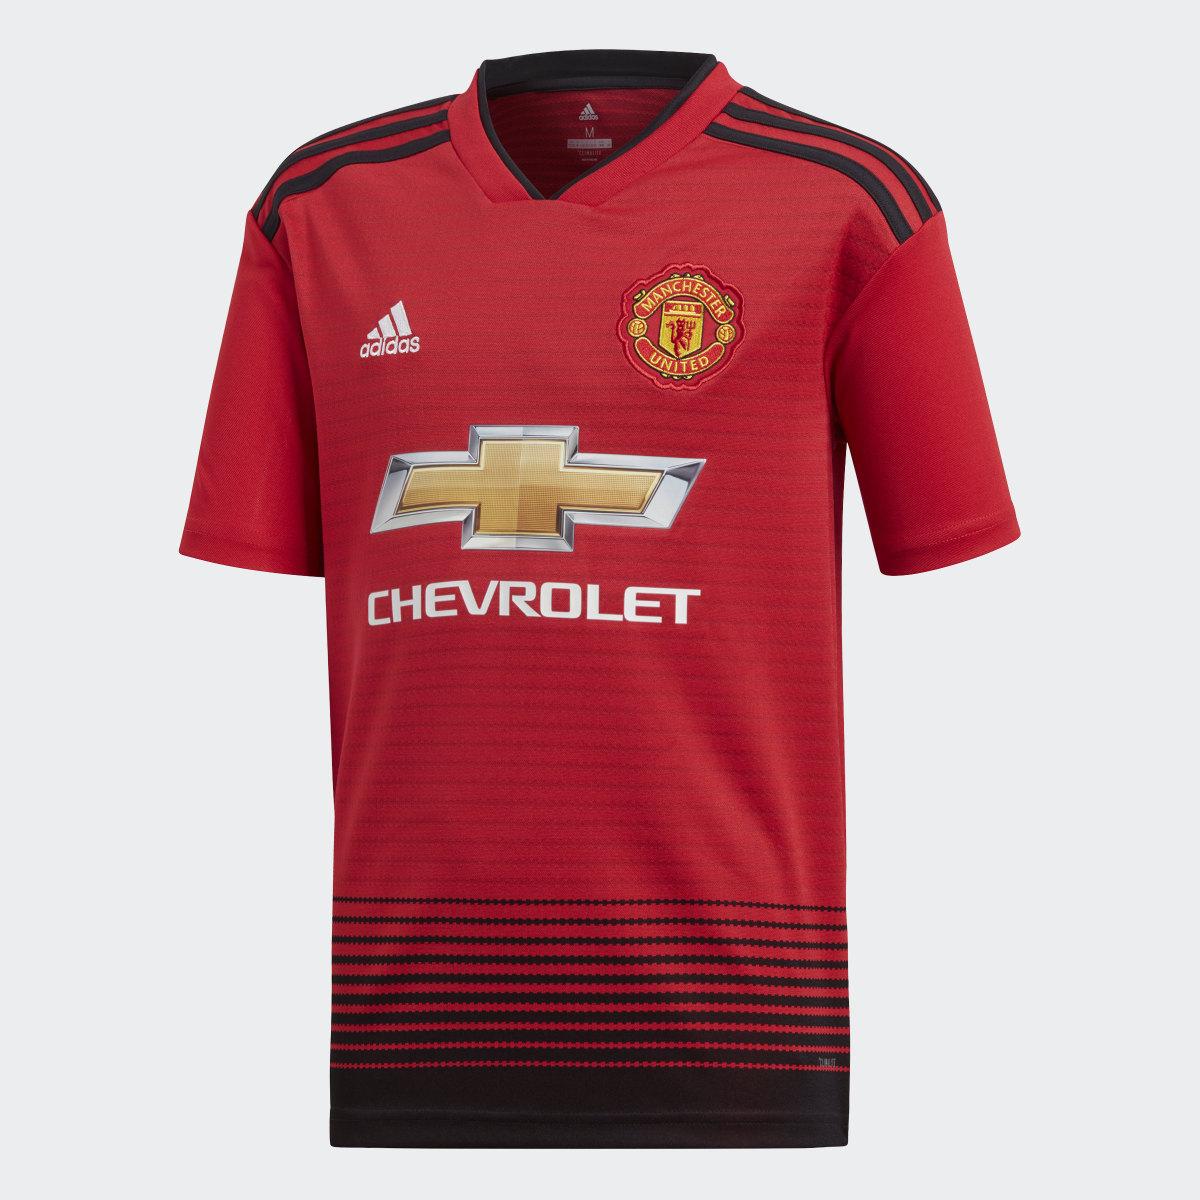 Camisola Principal do Manchester United